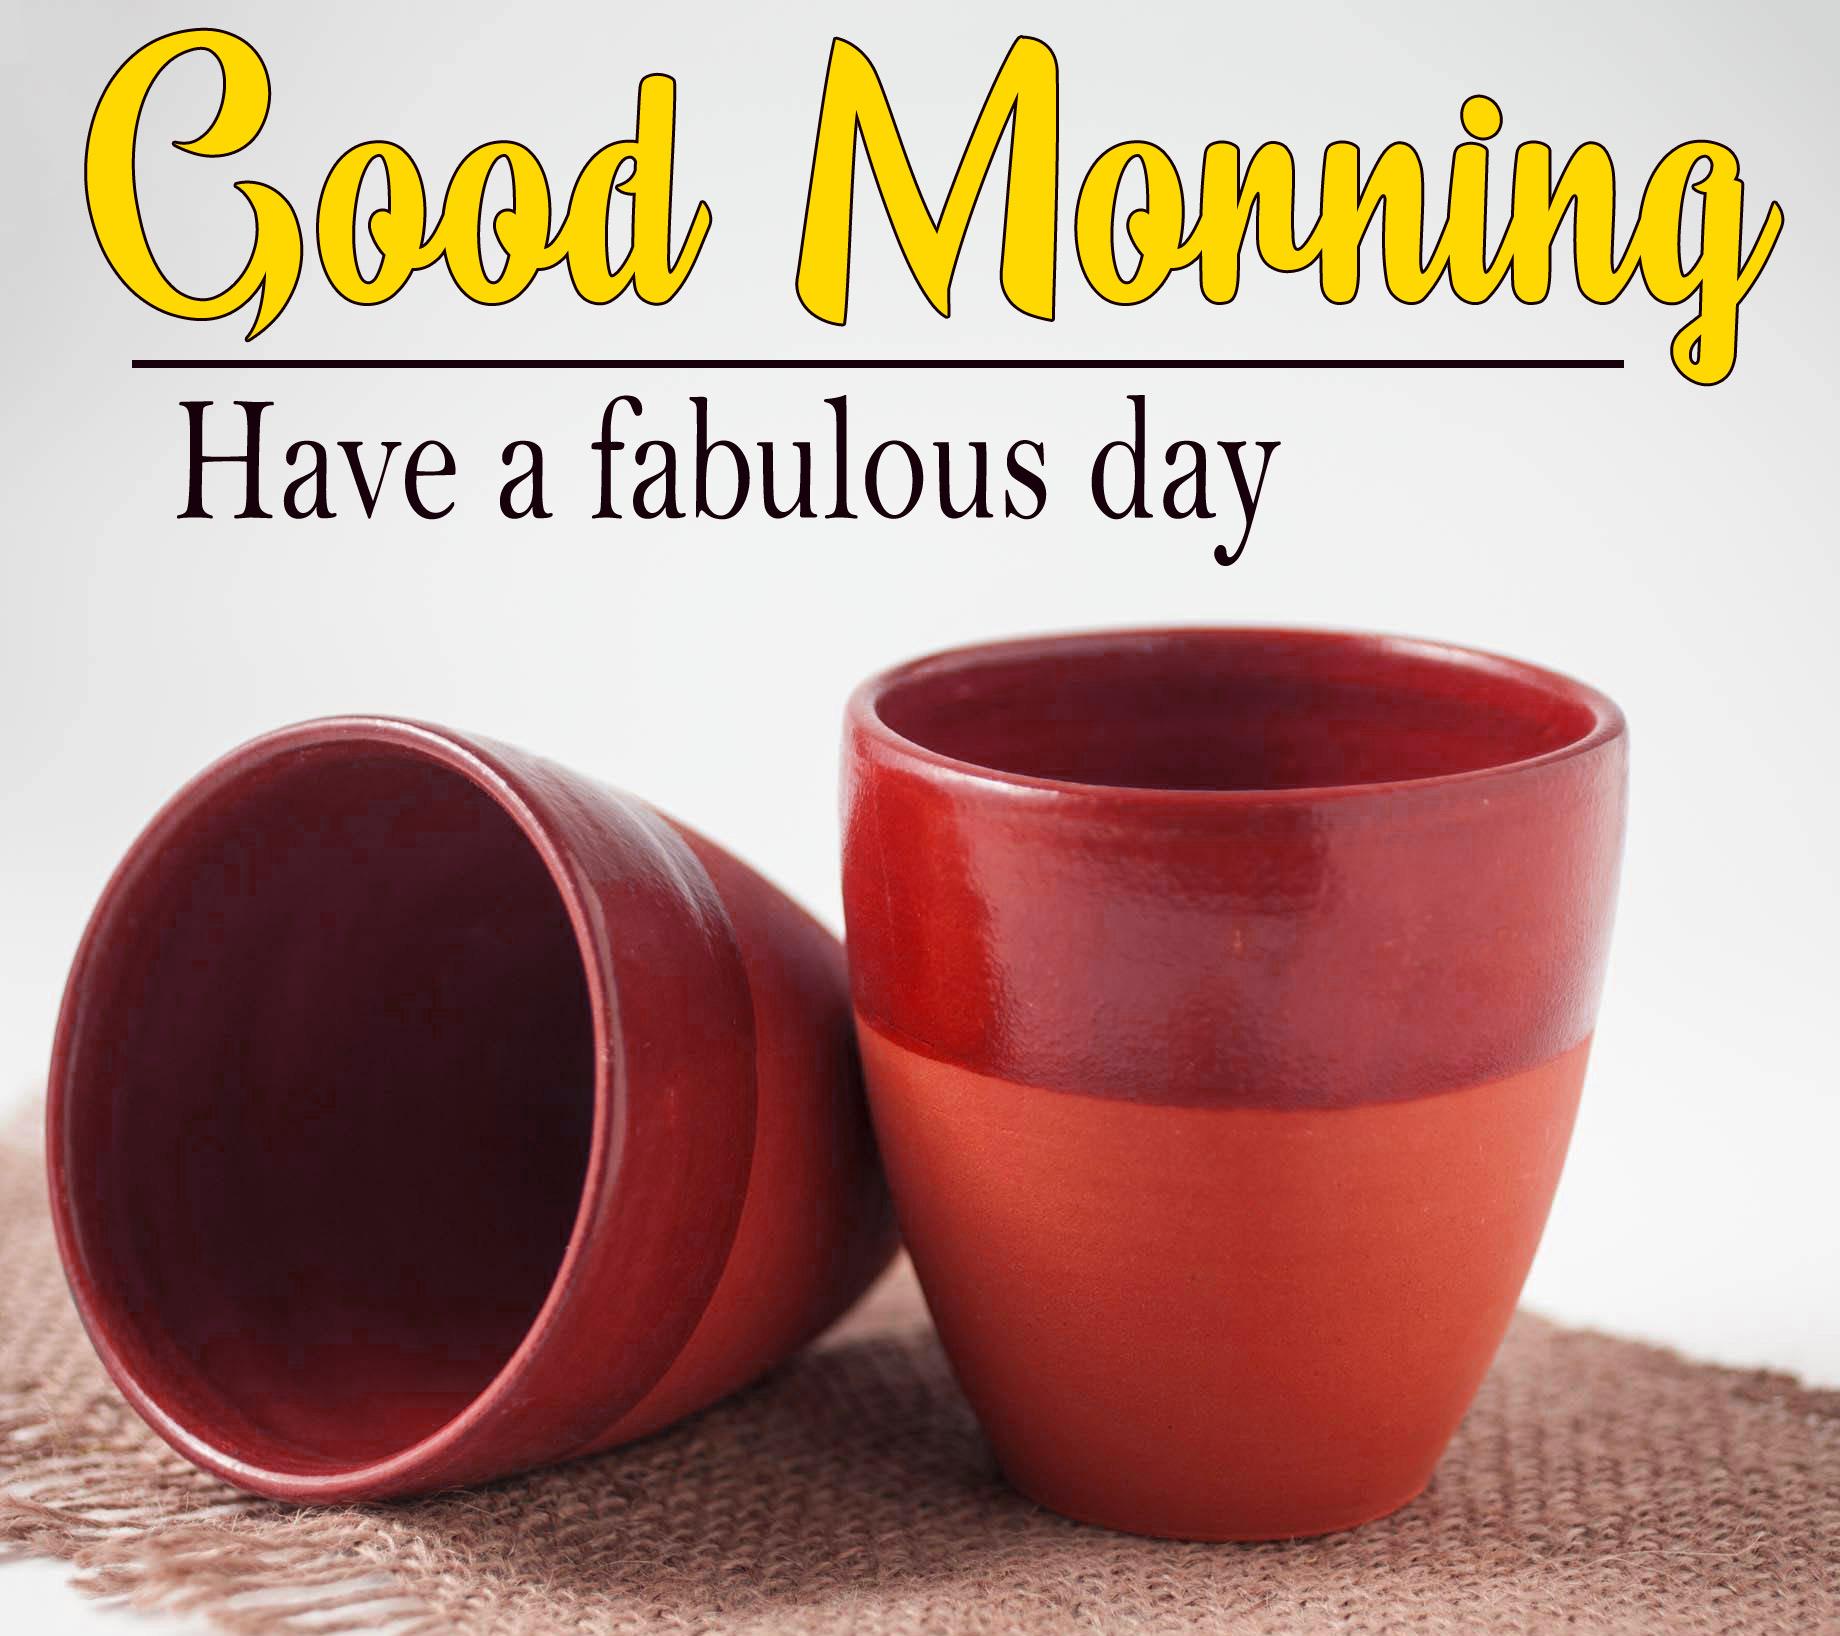 good morning pics 16 1